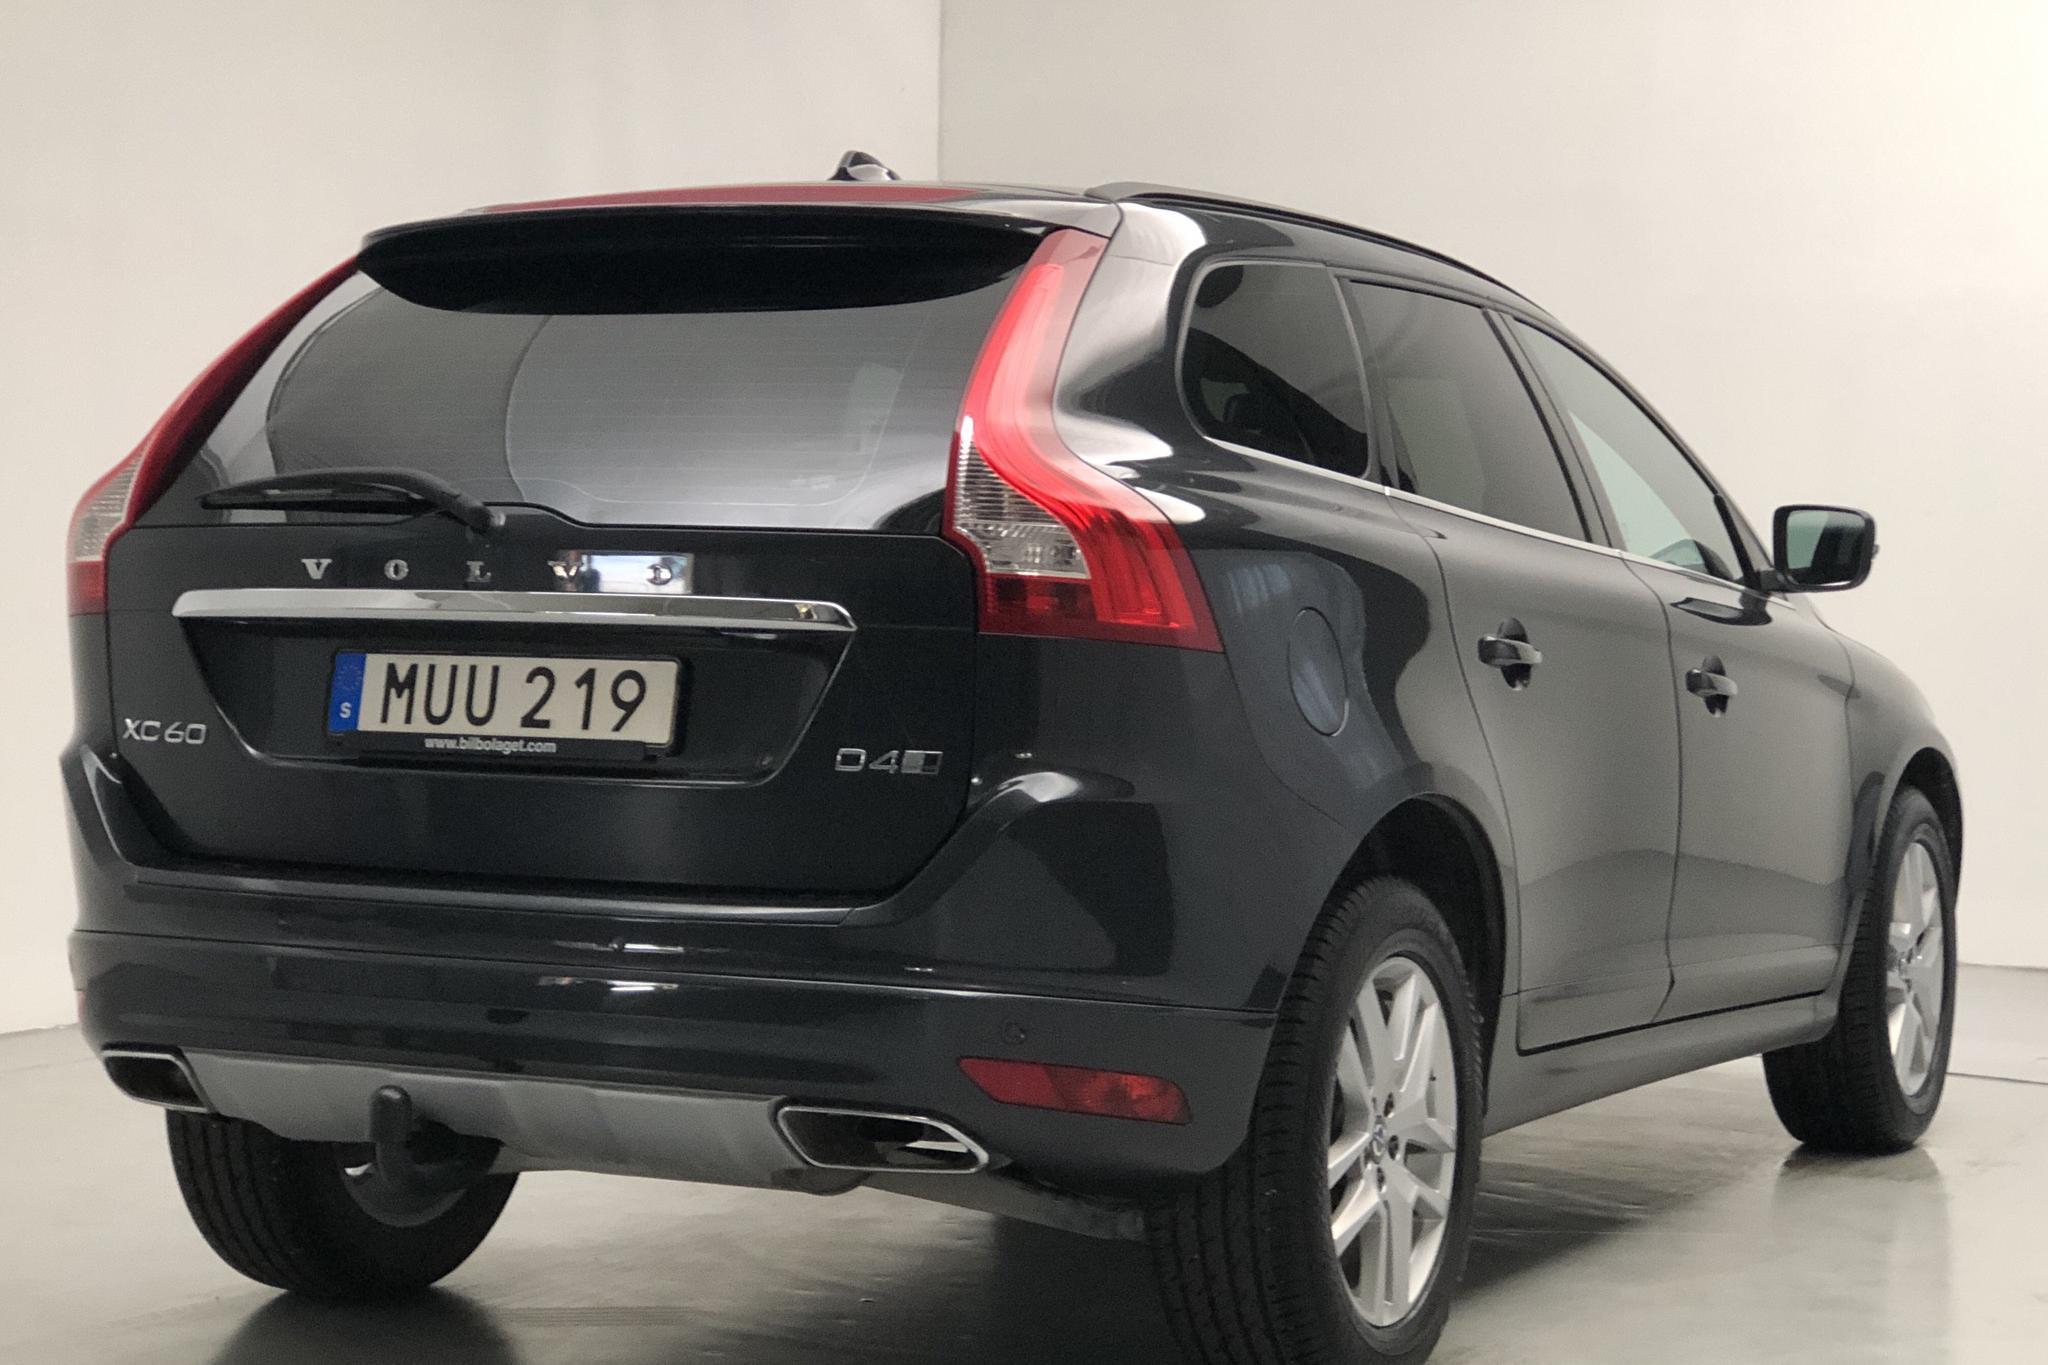 Volvo XC60 D4 AWD (190hk) - 13 844 mil - Automat - grå - 2017